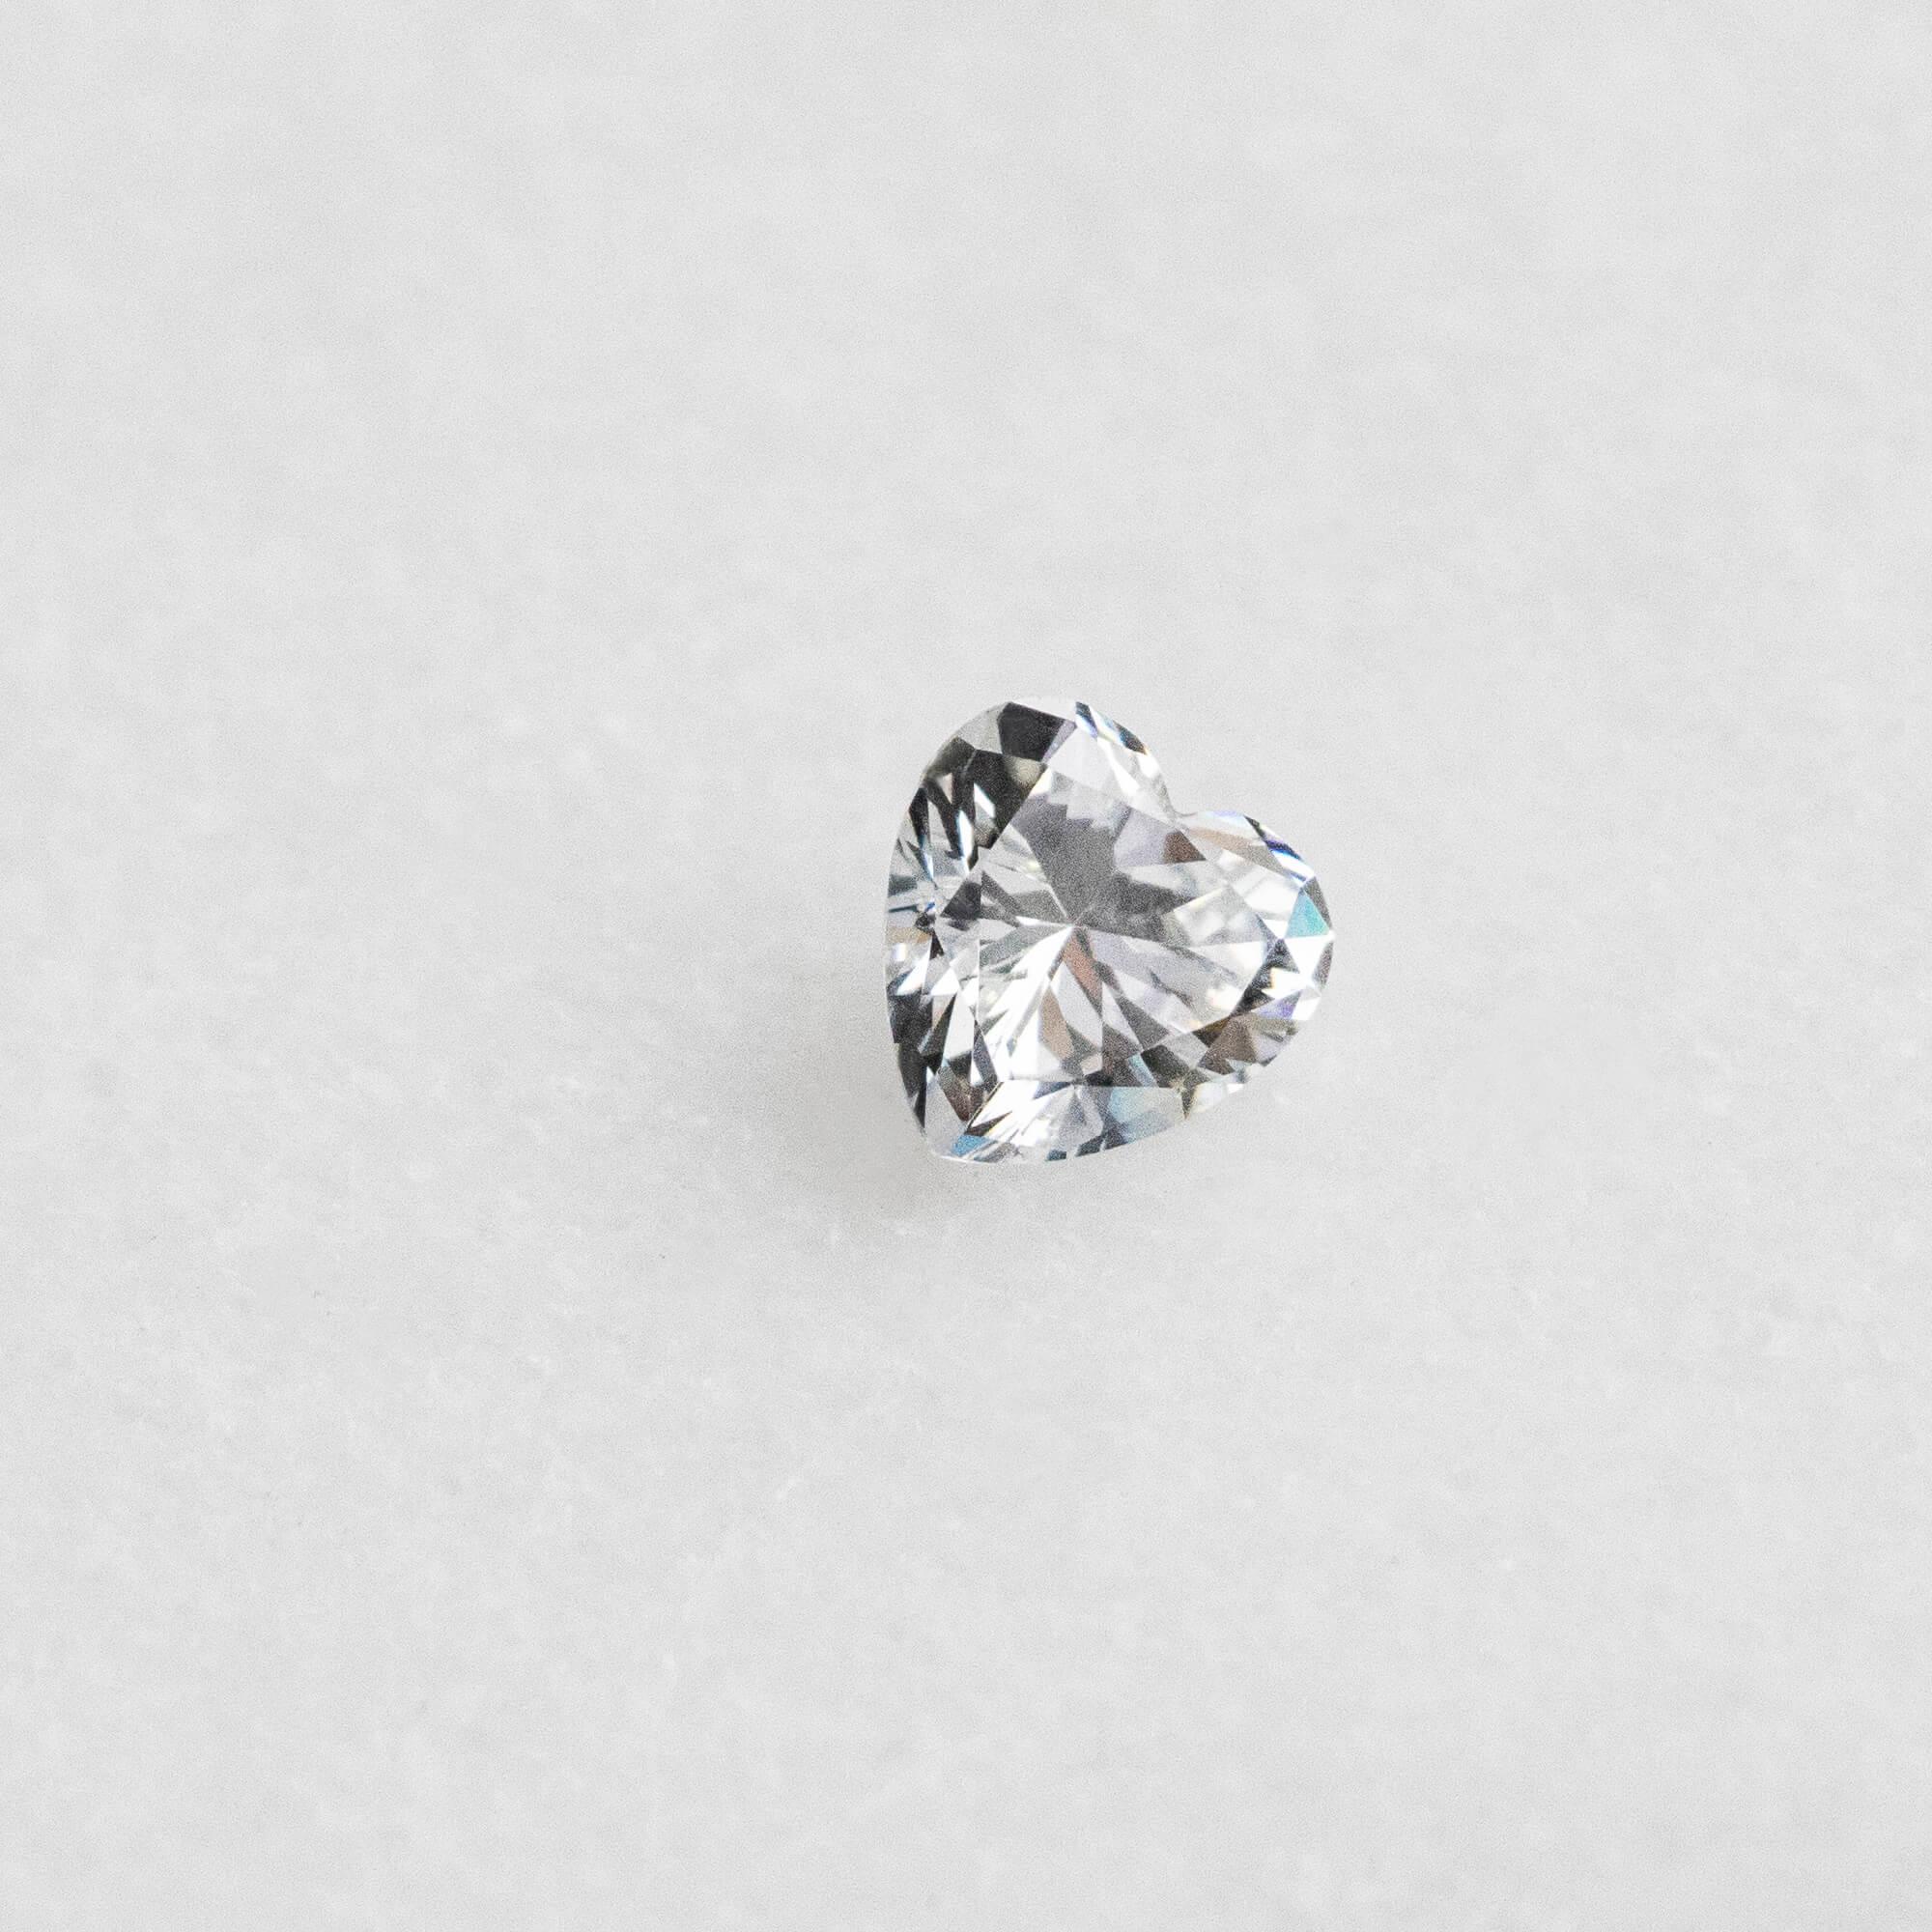 A Heart Nexus Diamond alternative.